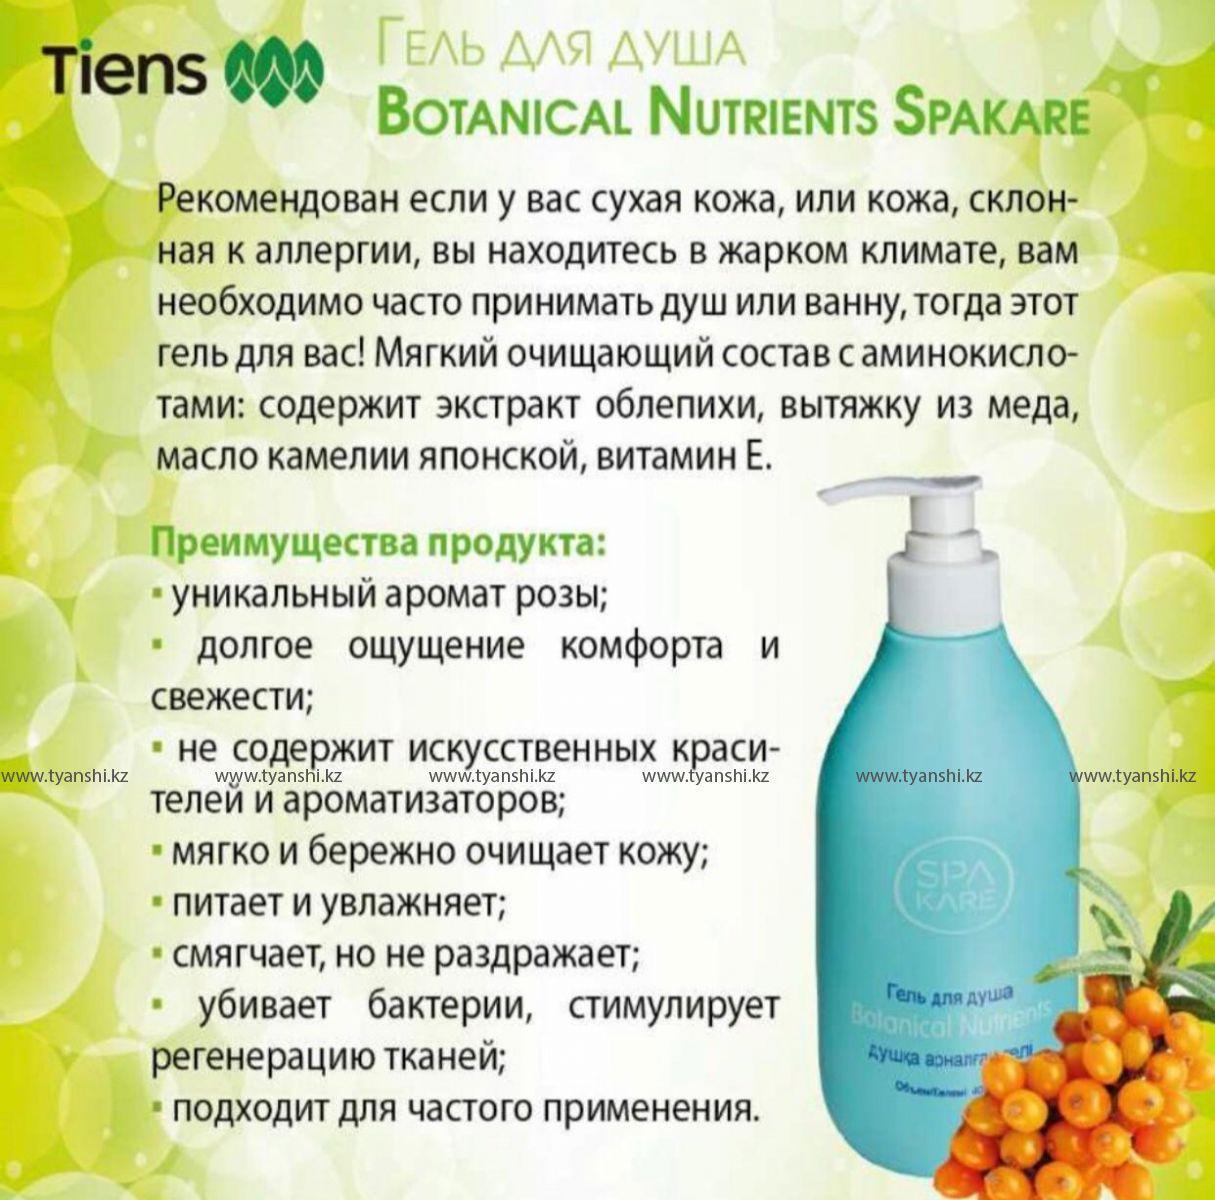 ГЕЛЬ ДЛЯ ДУША Botanical Nutrients Spakare - фото 5